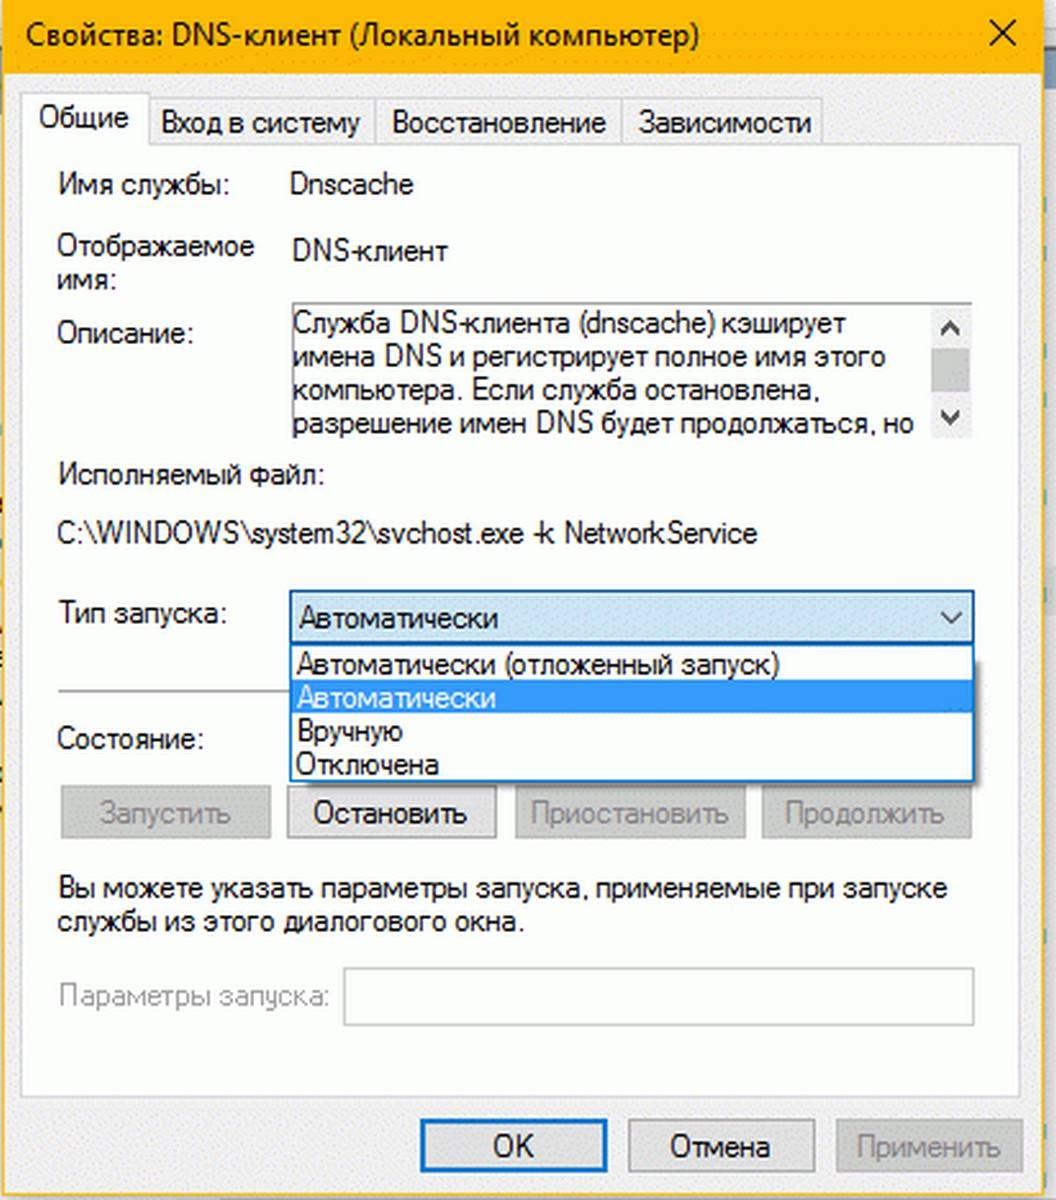 snip_20160701130135(3).jpg